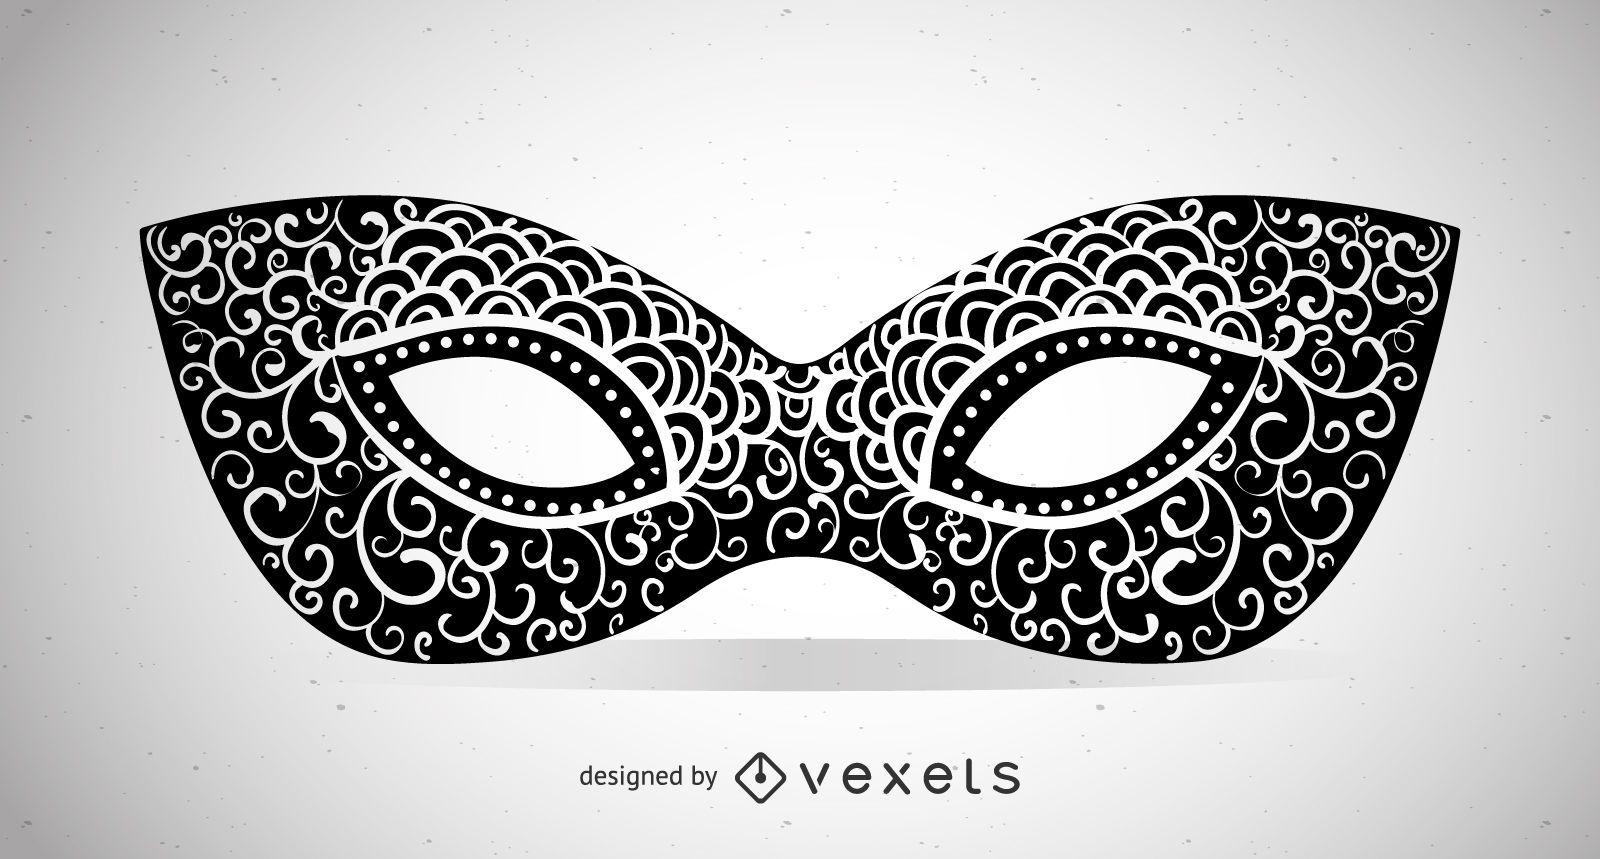 Swirly masquerade mask illustration